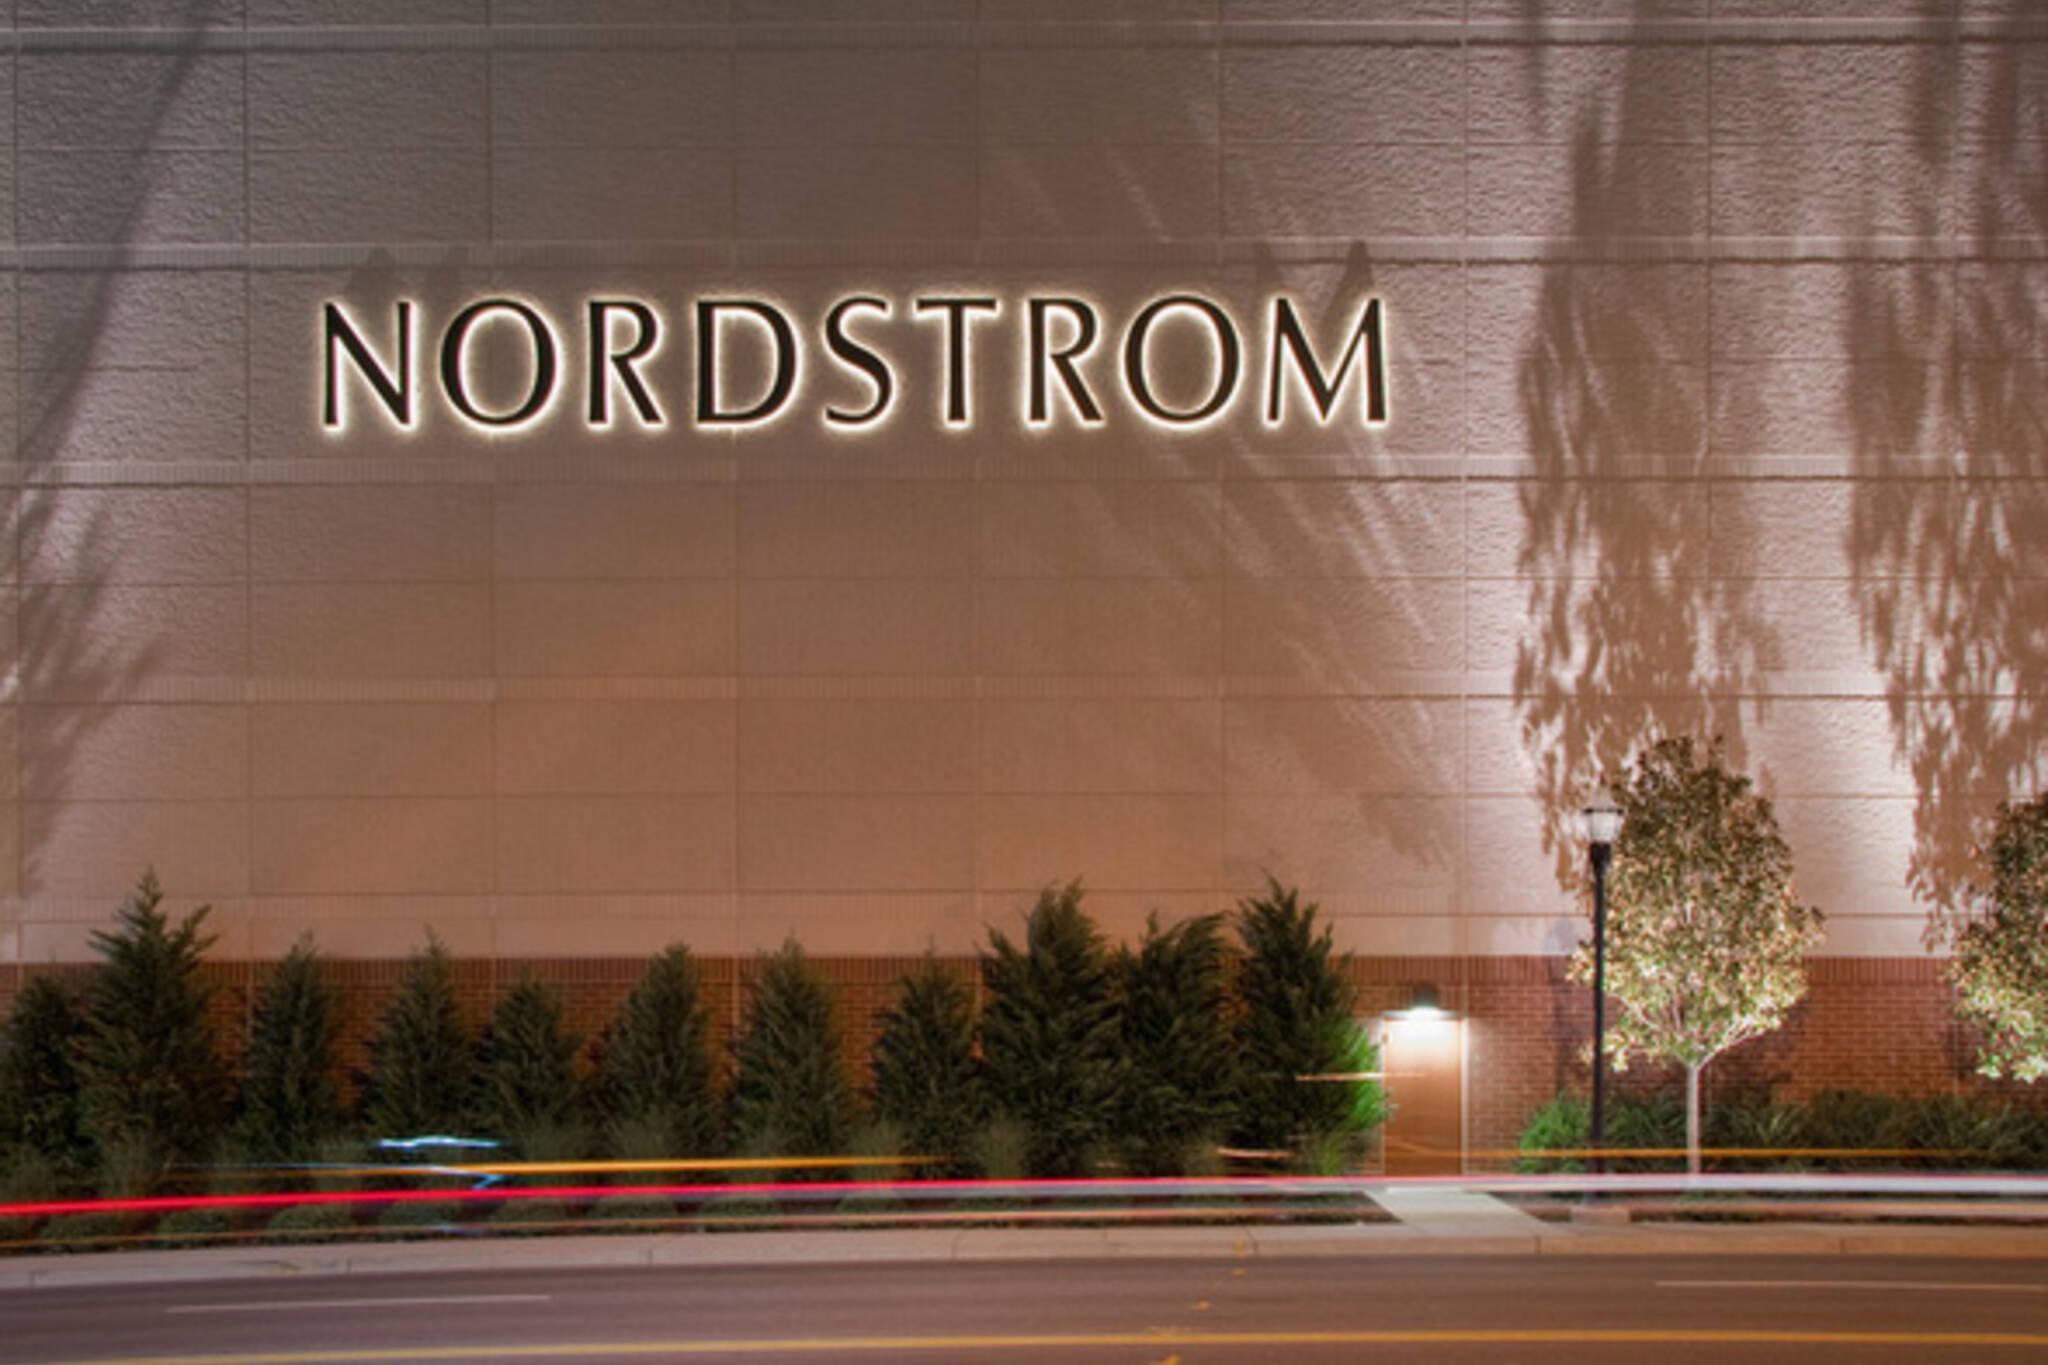 Nordstrom Toronto